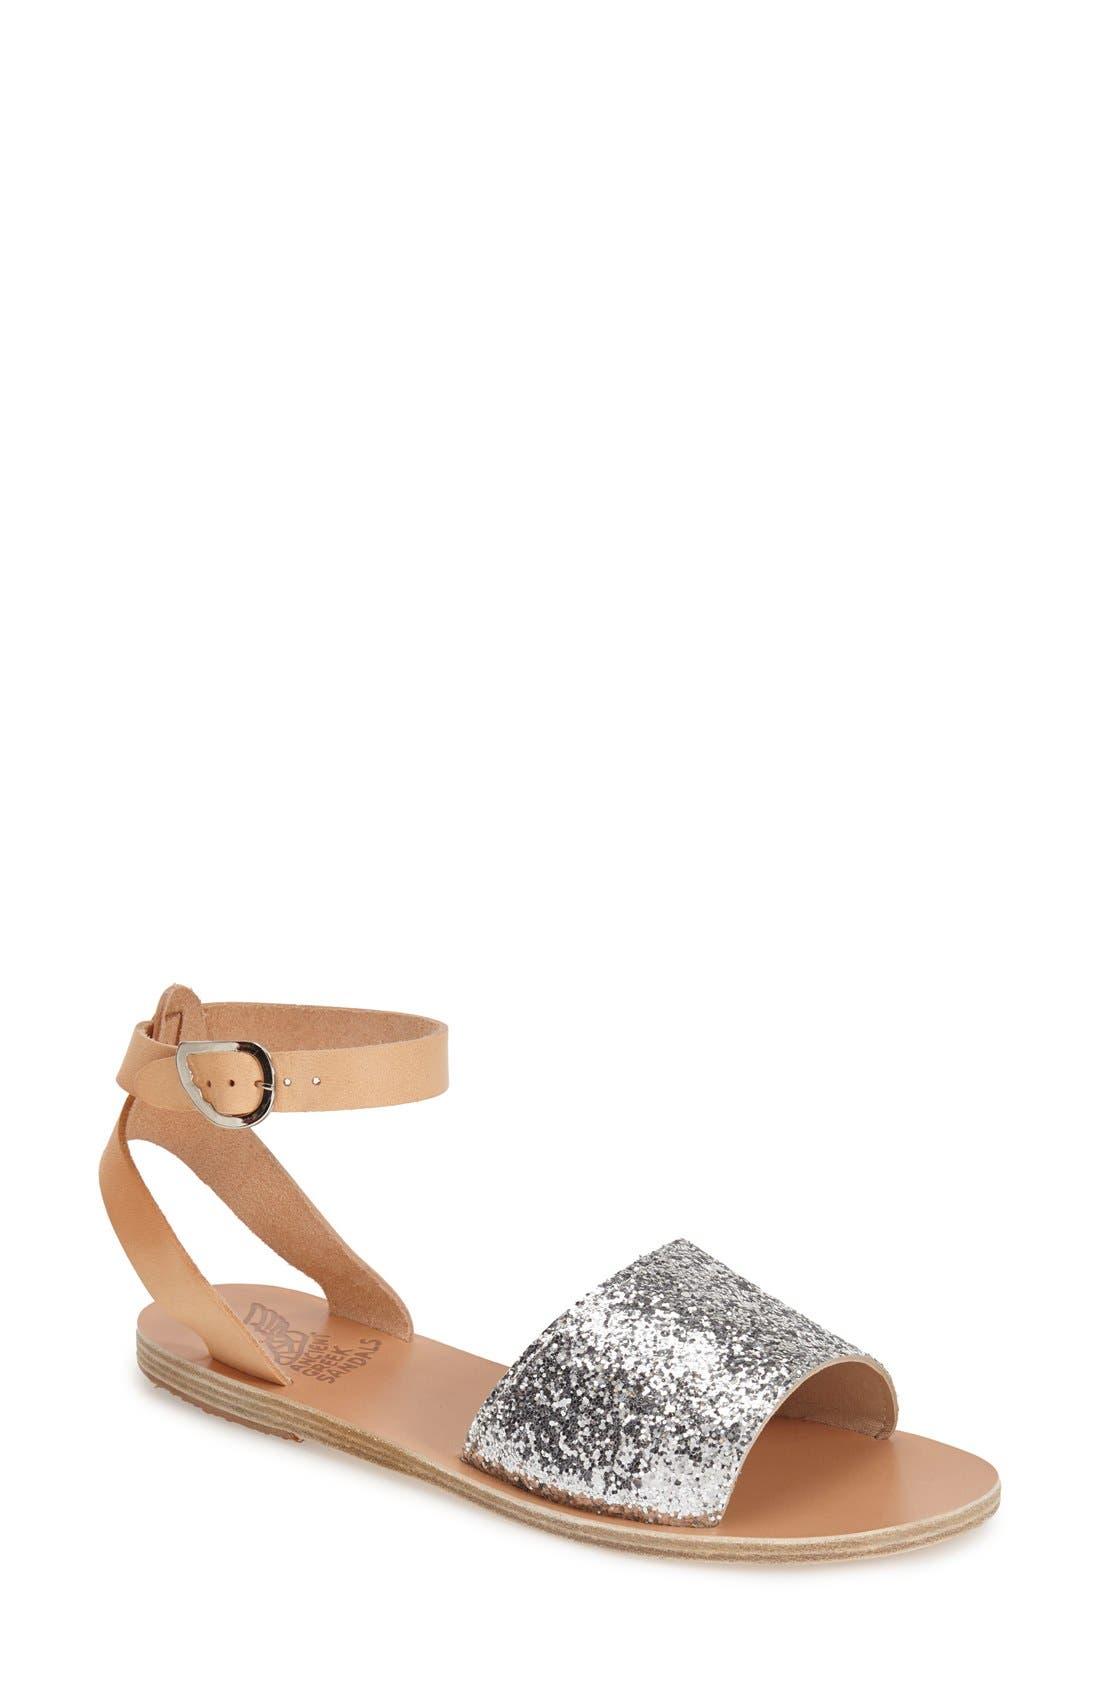 Main Image - Ancient Greek Sandals 'Thalpori' Leather Ankle Strap Sandal (Women)